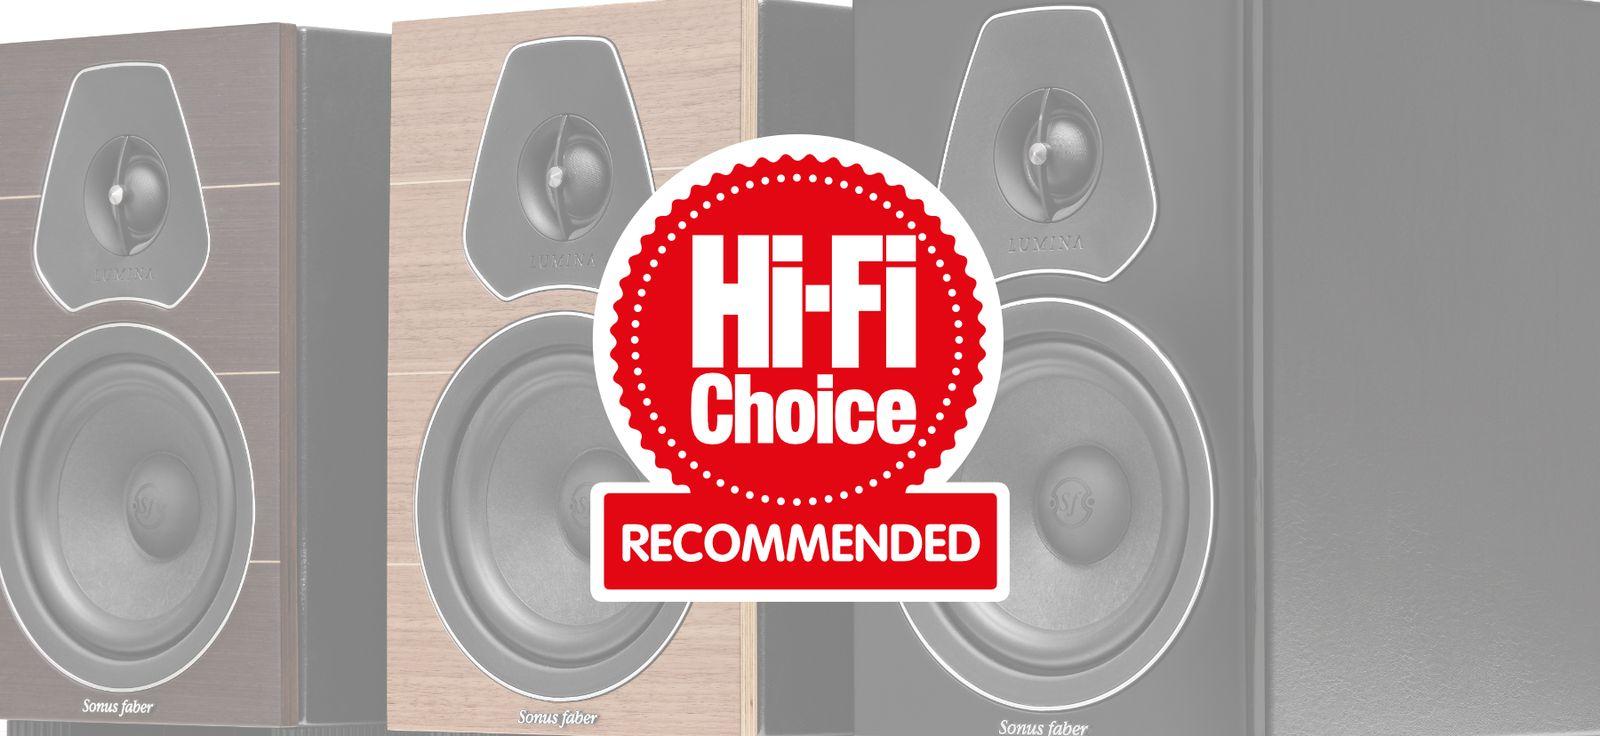 Hi-Fi Choice magazine gives a 'Recommended Award' to Sonus faber's NEW Lumina II speaker